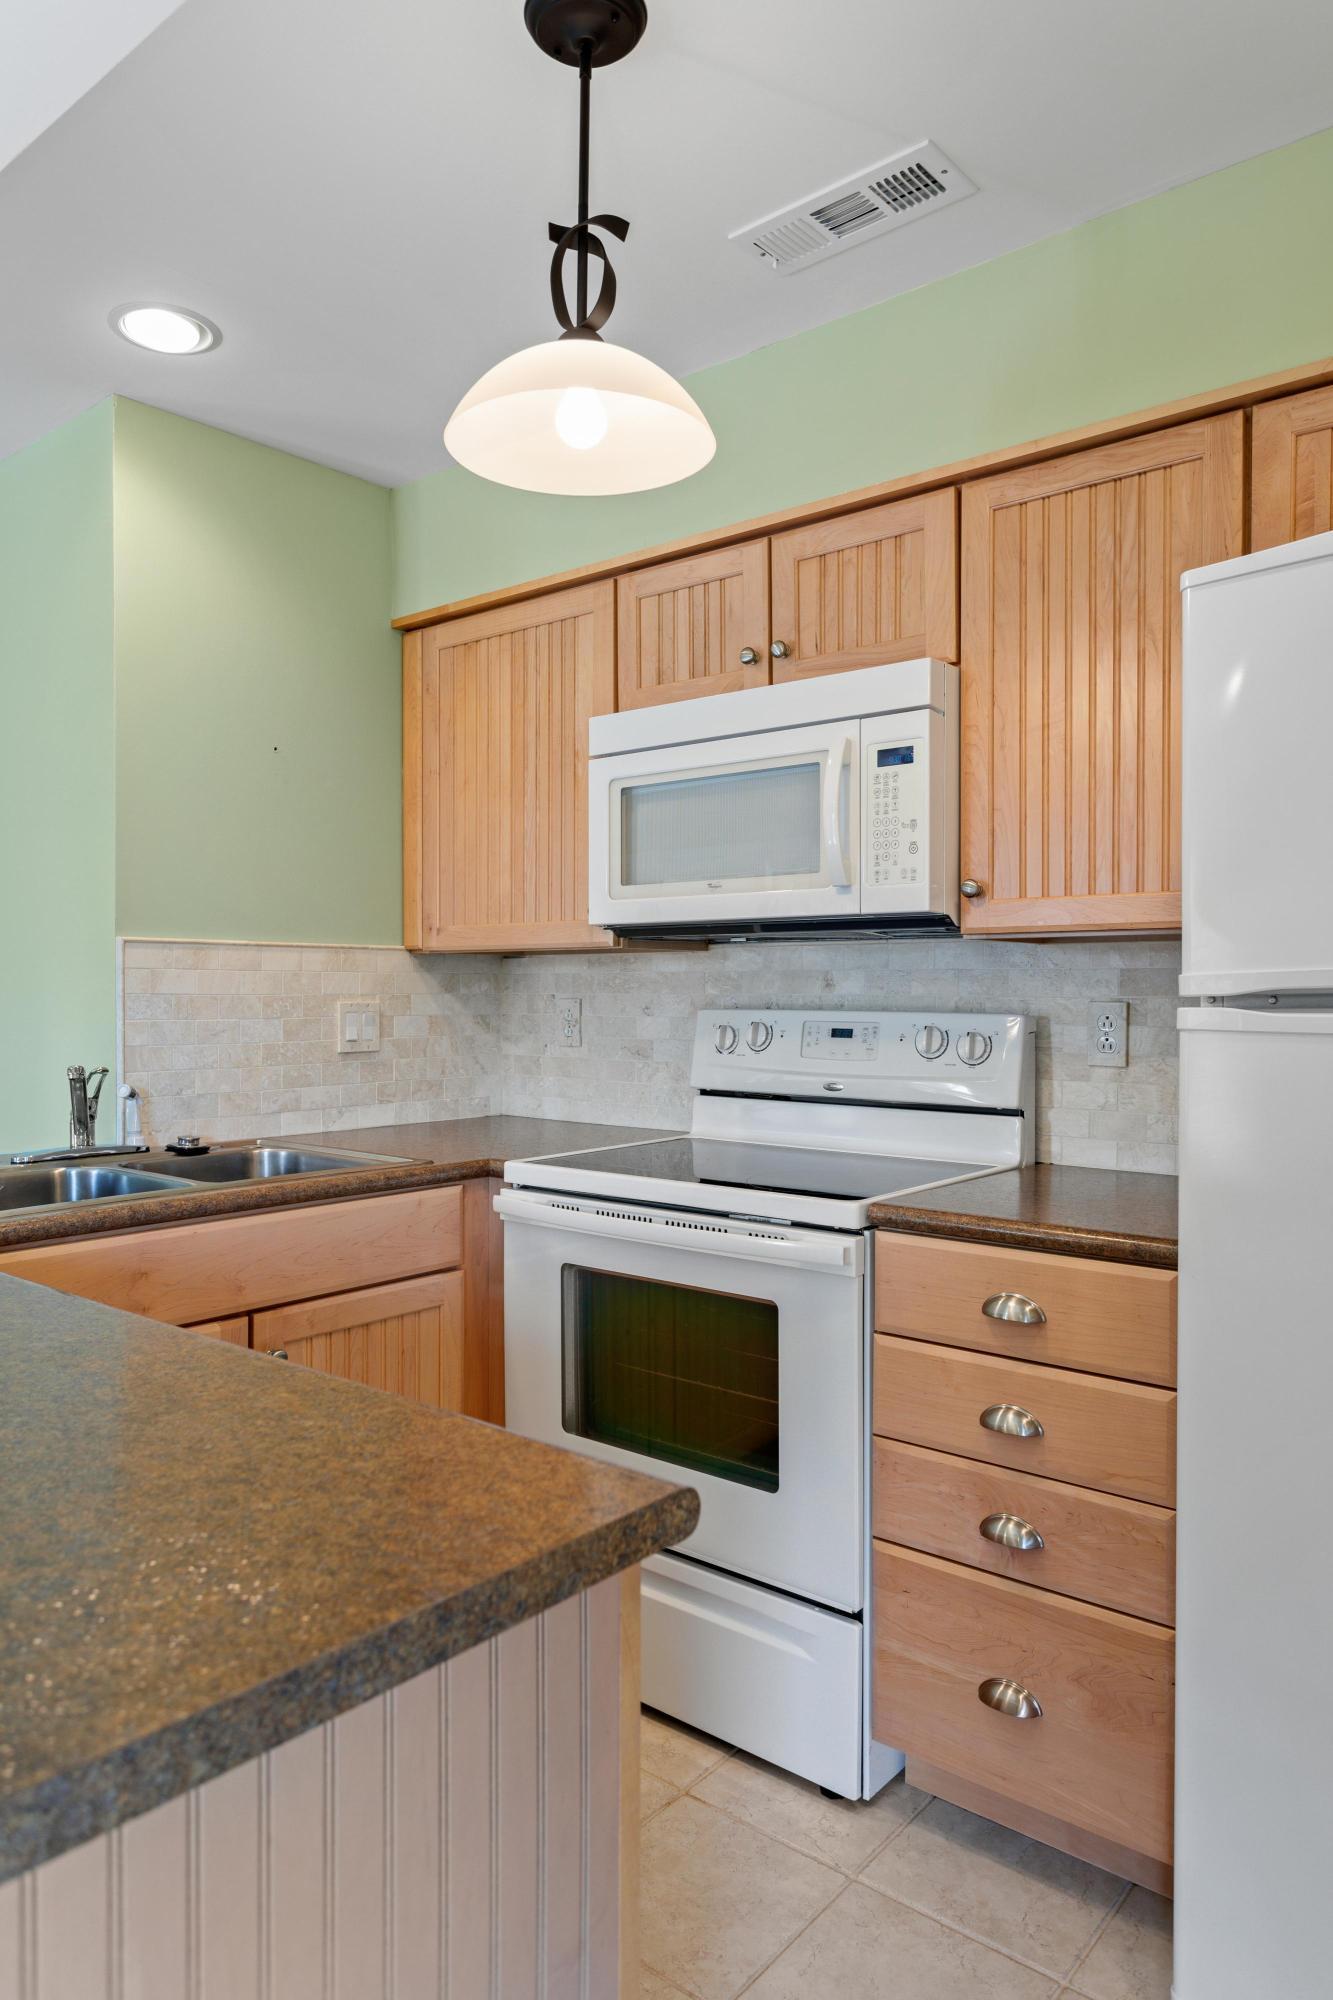 Courtside Villas Homes For Sale - 1640 Live Oak Park, Seabrook Island, SC - 6